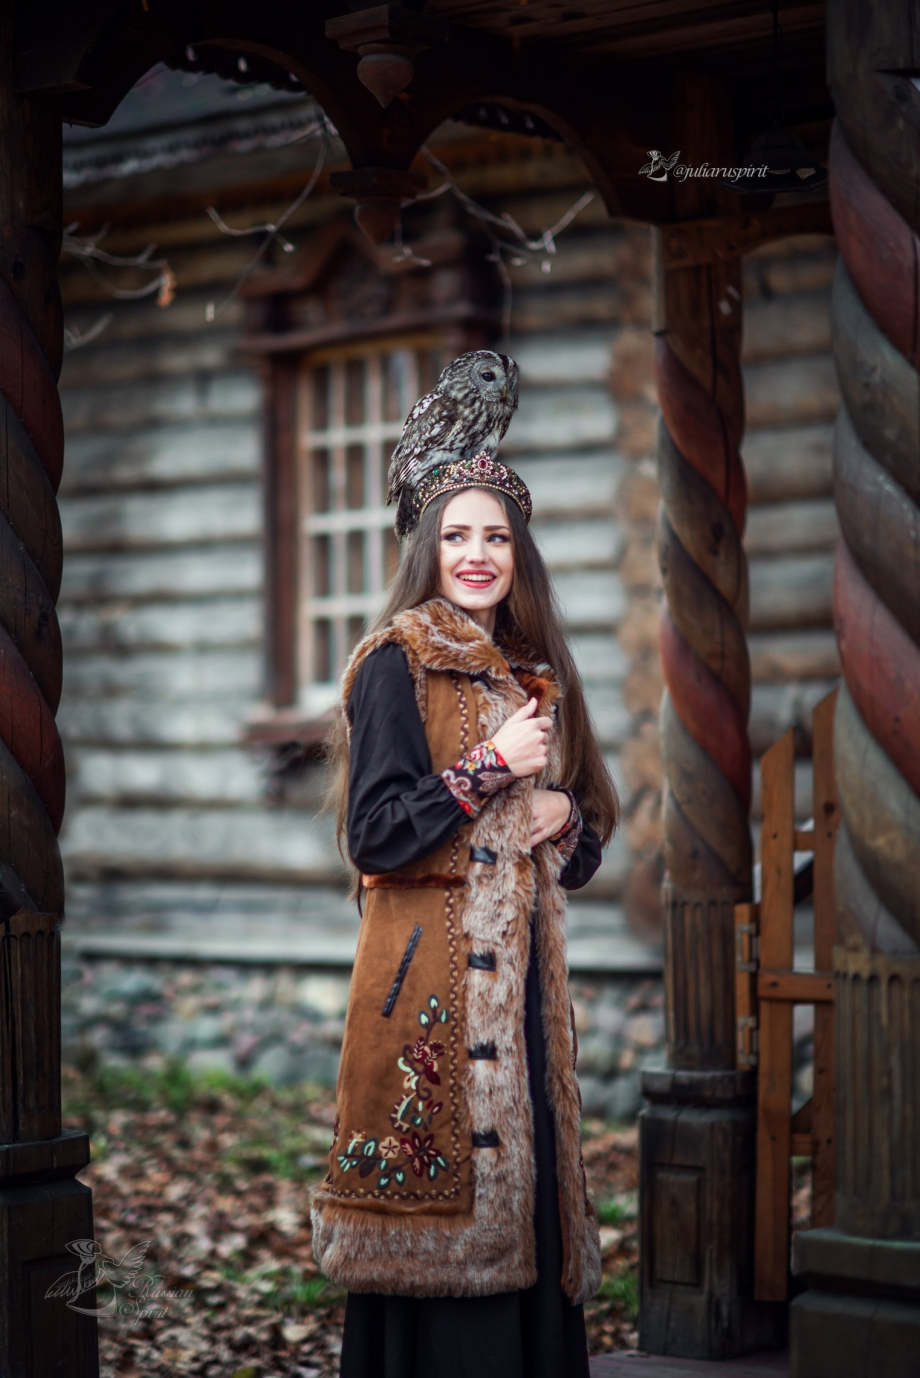 Девушка в жилете в русском стиле на фоне терема